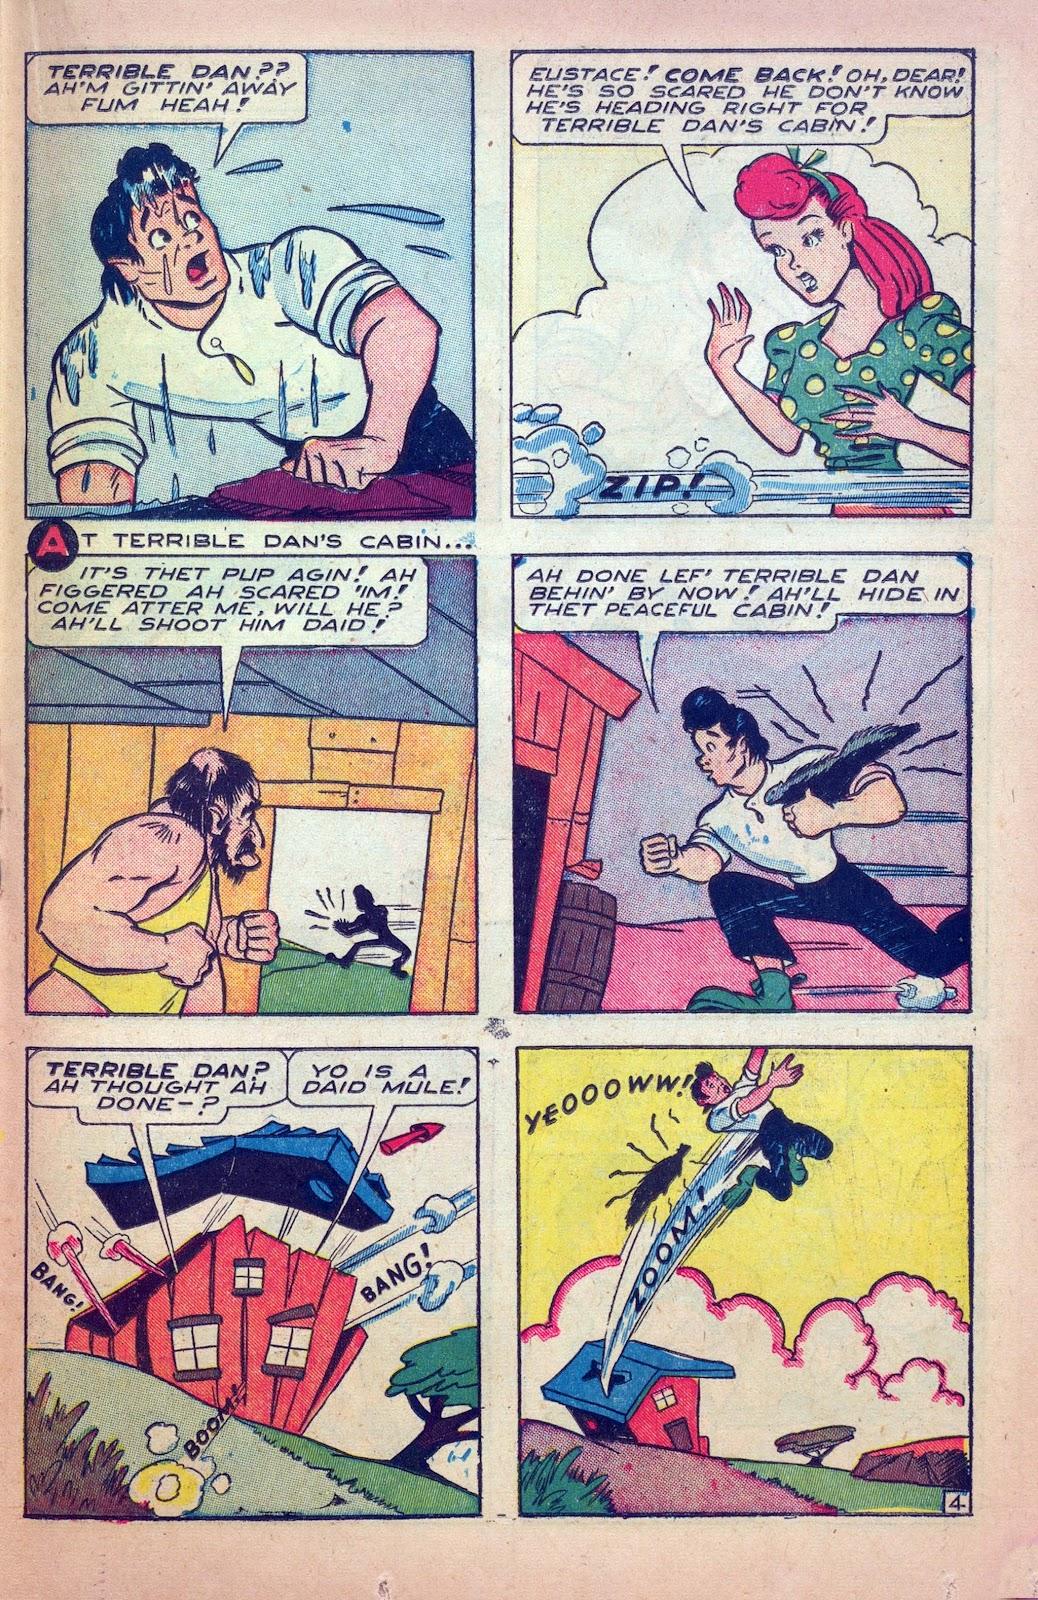 Read online Joker Comics comic -  Issue #20 - 19